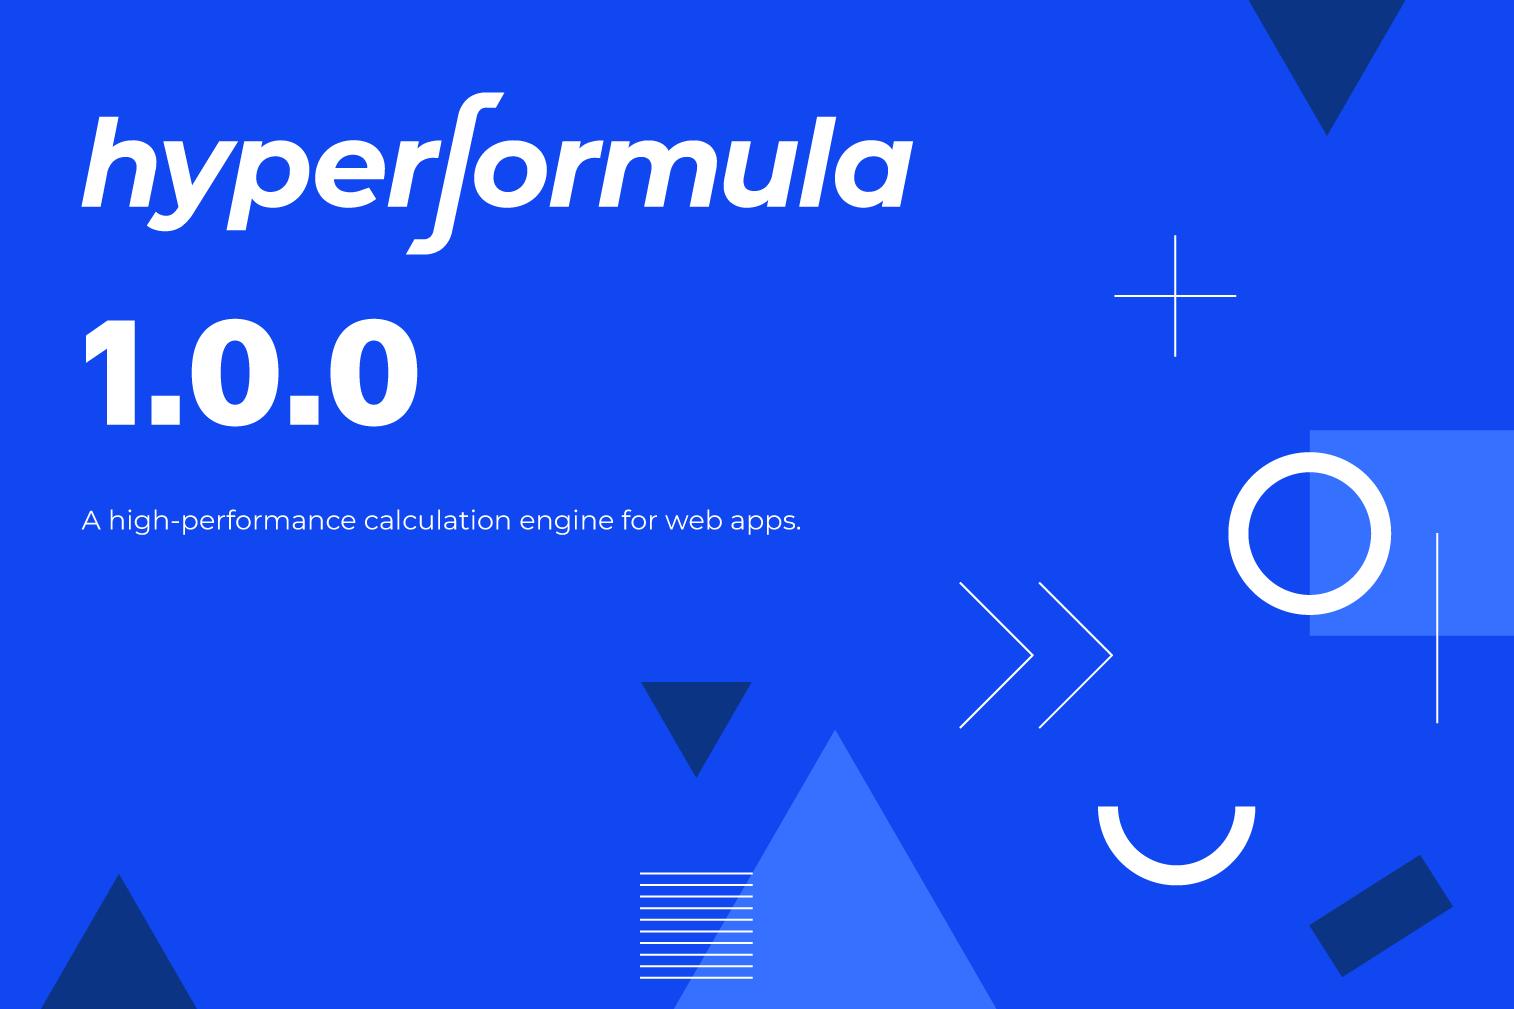 Hyperformula 1.0.0 release illustration